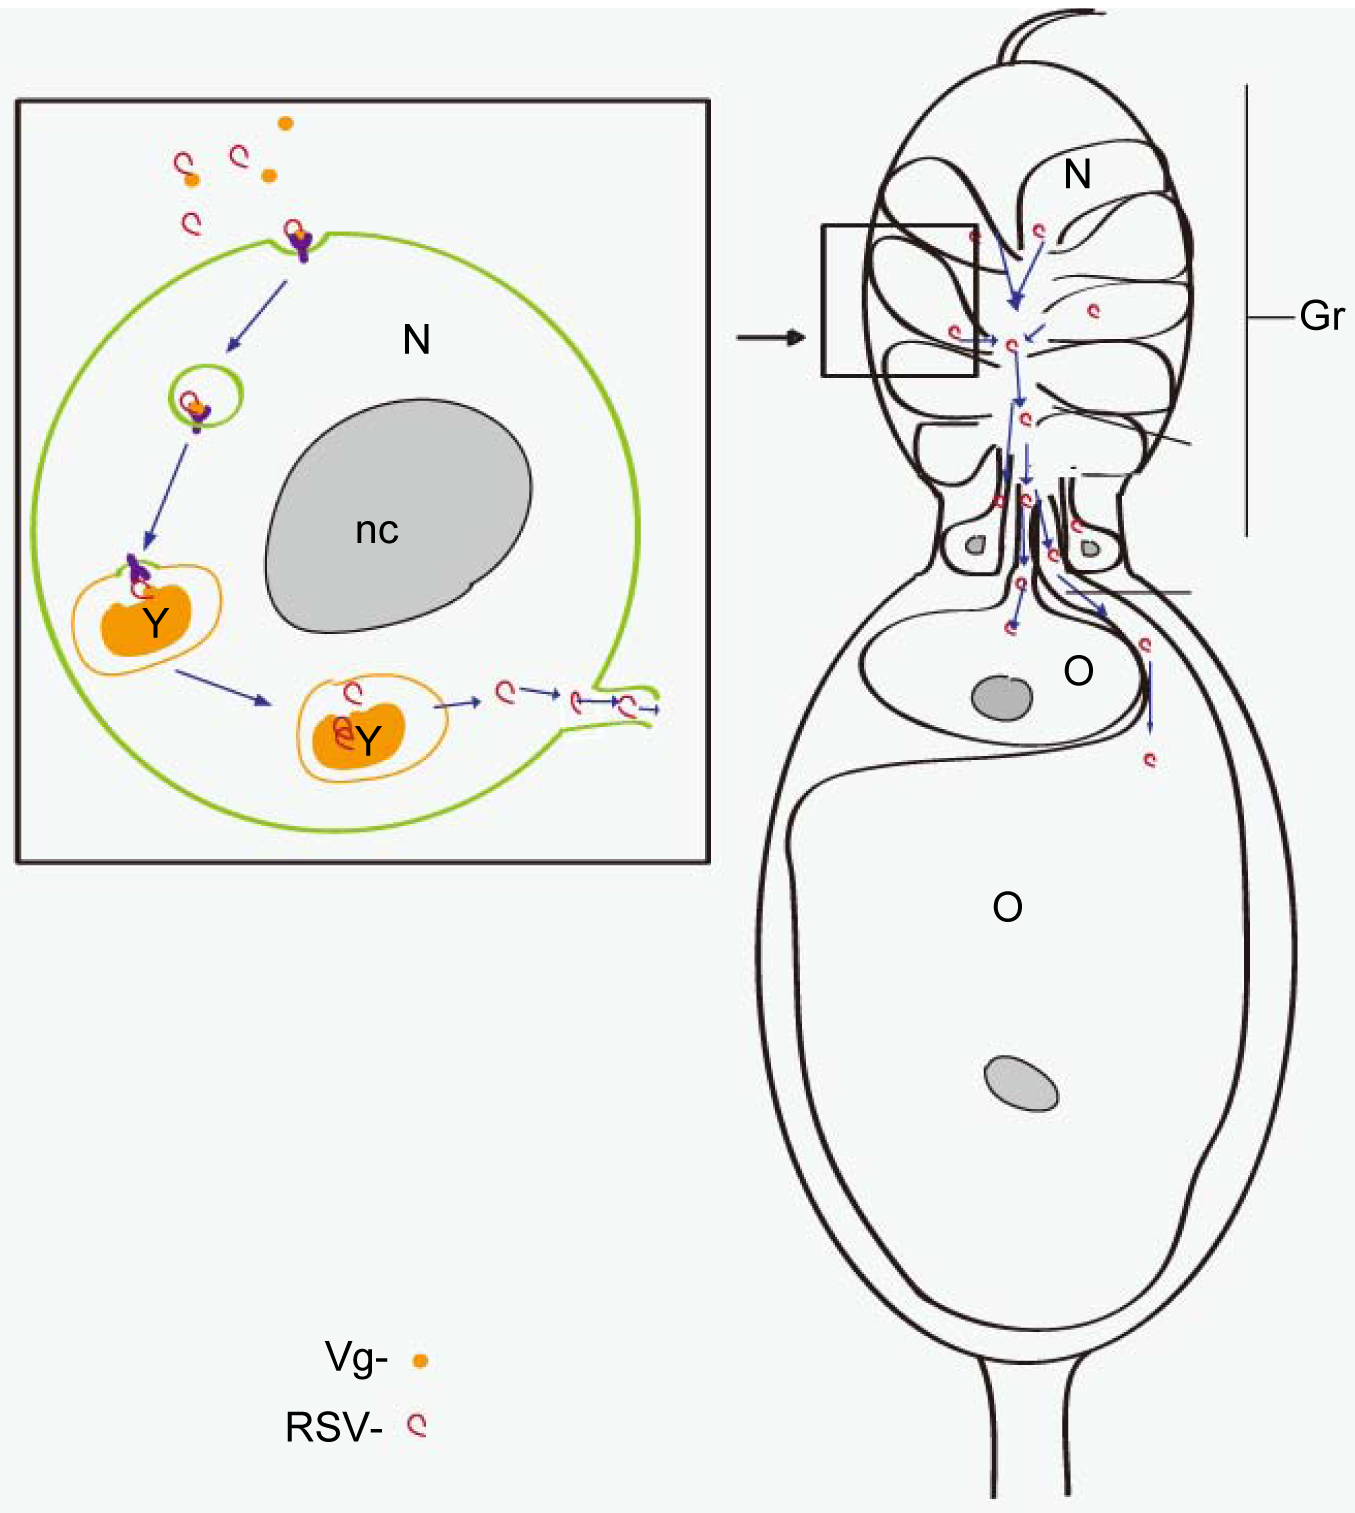 Model of RSV transovarial transmission.